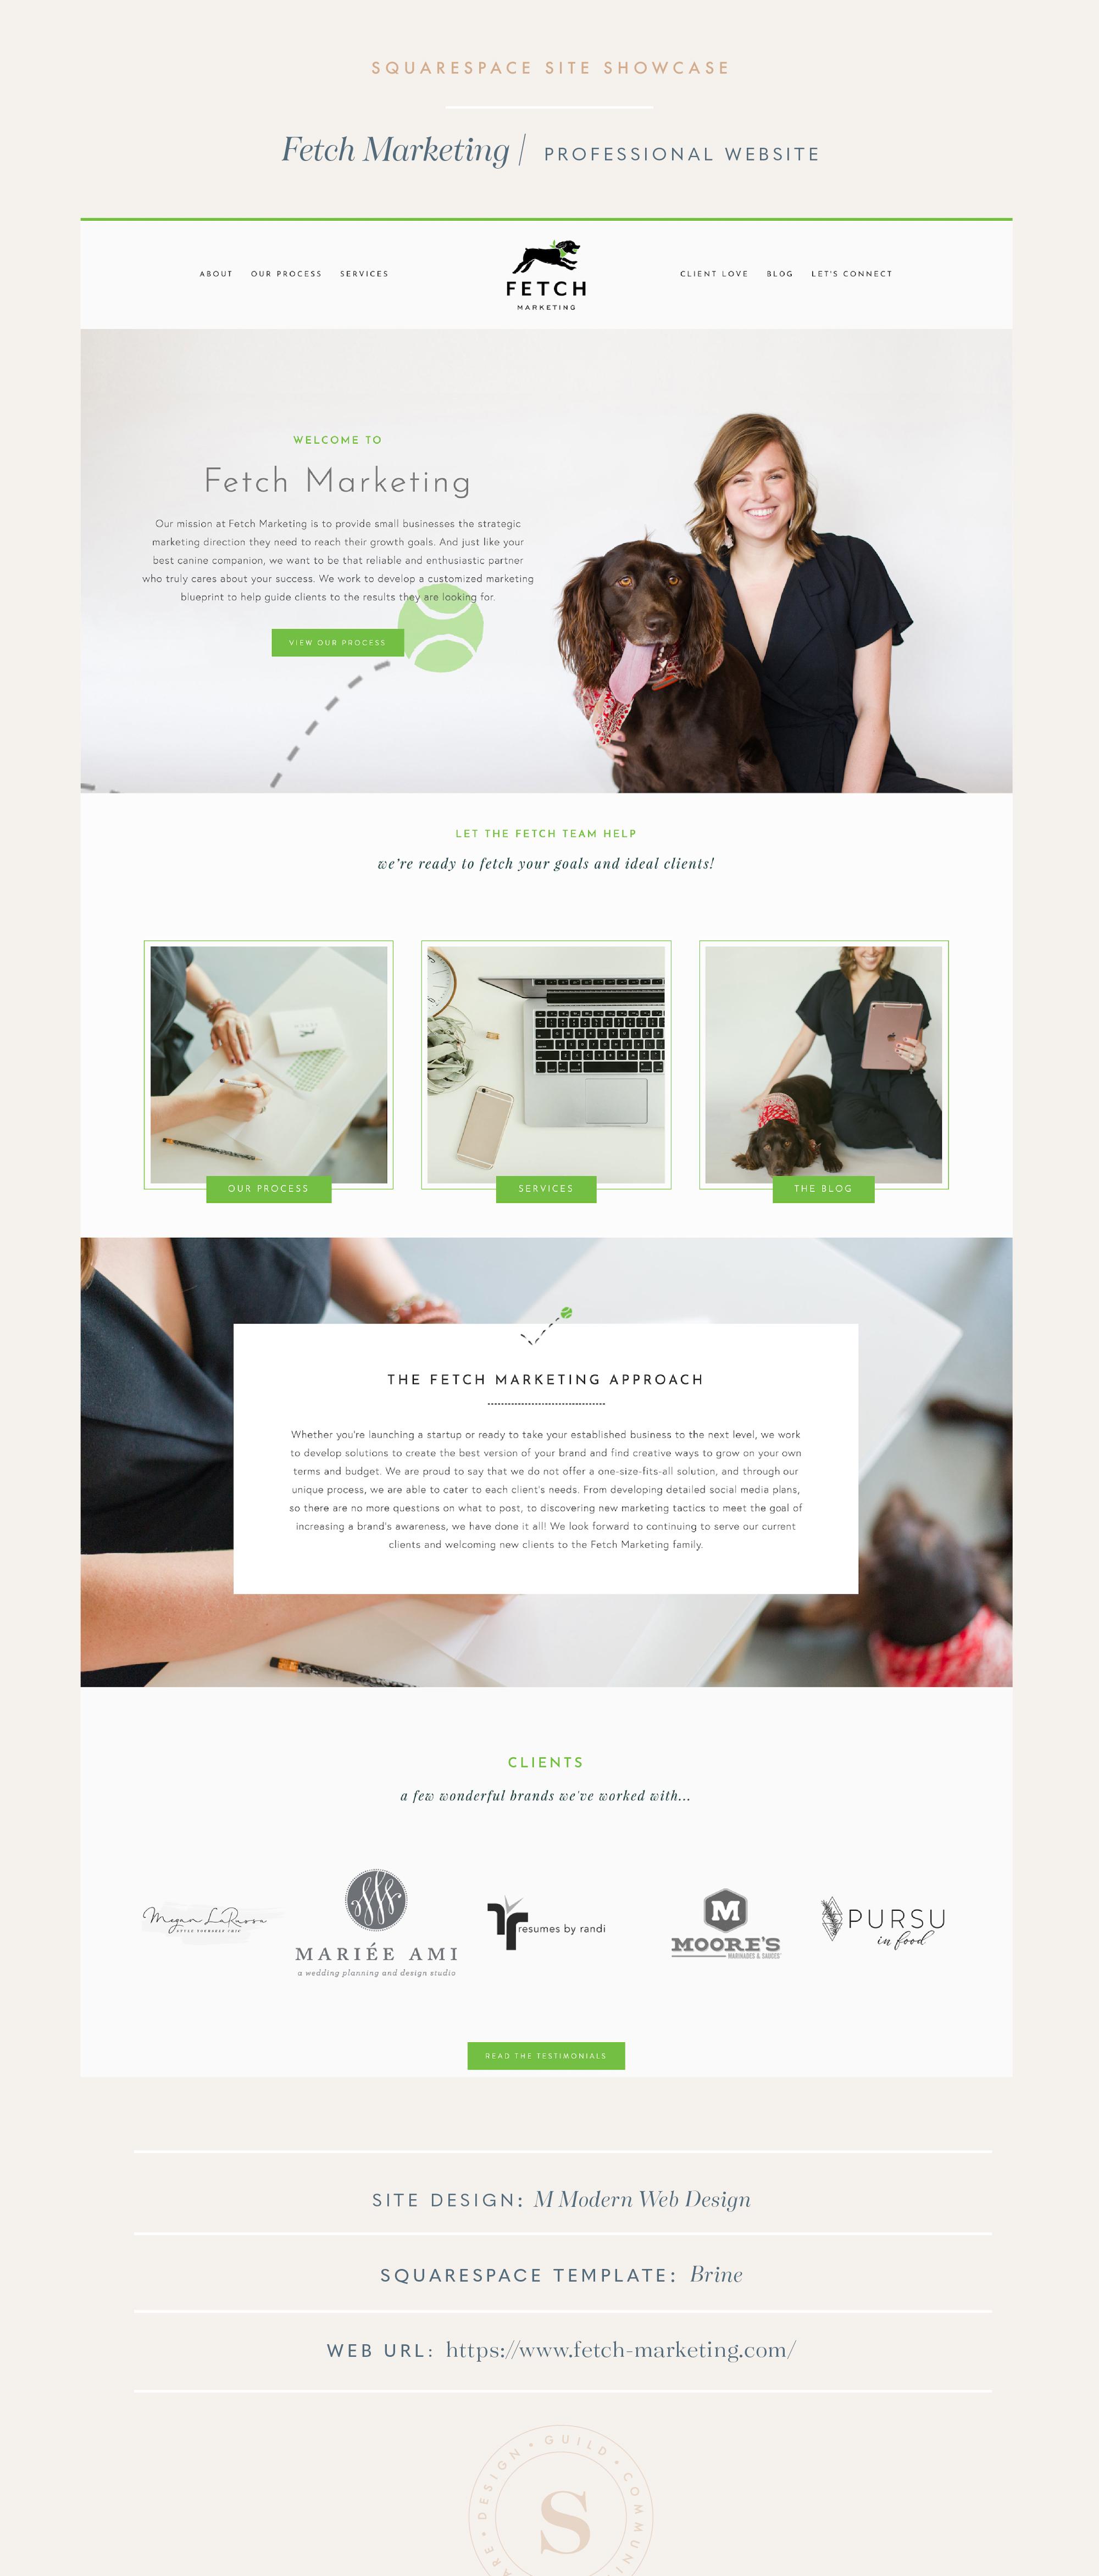 Fetch Marketing Squarespace Site Design on Brine